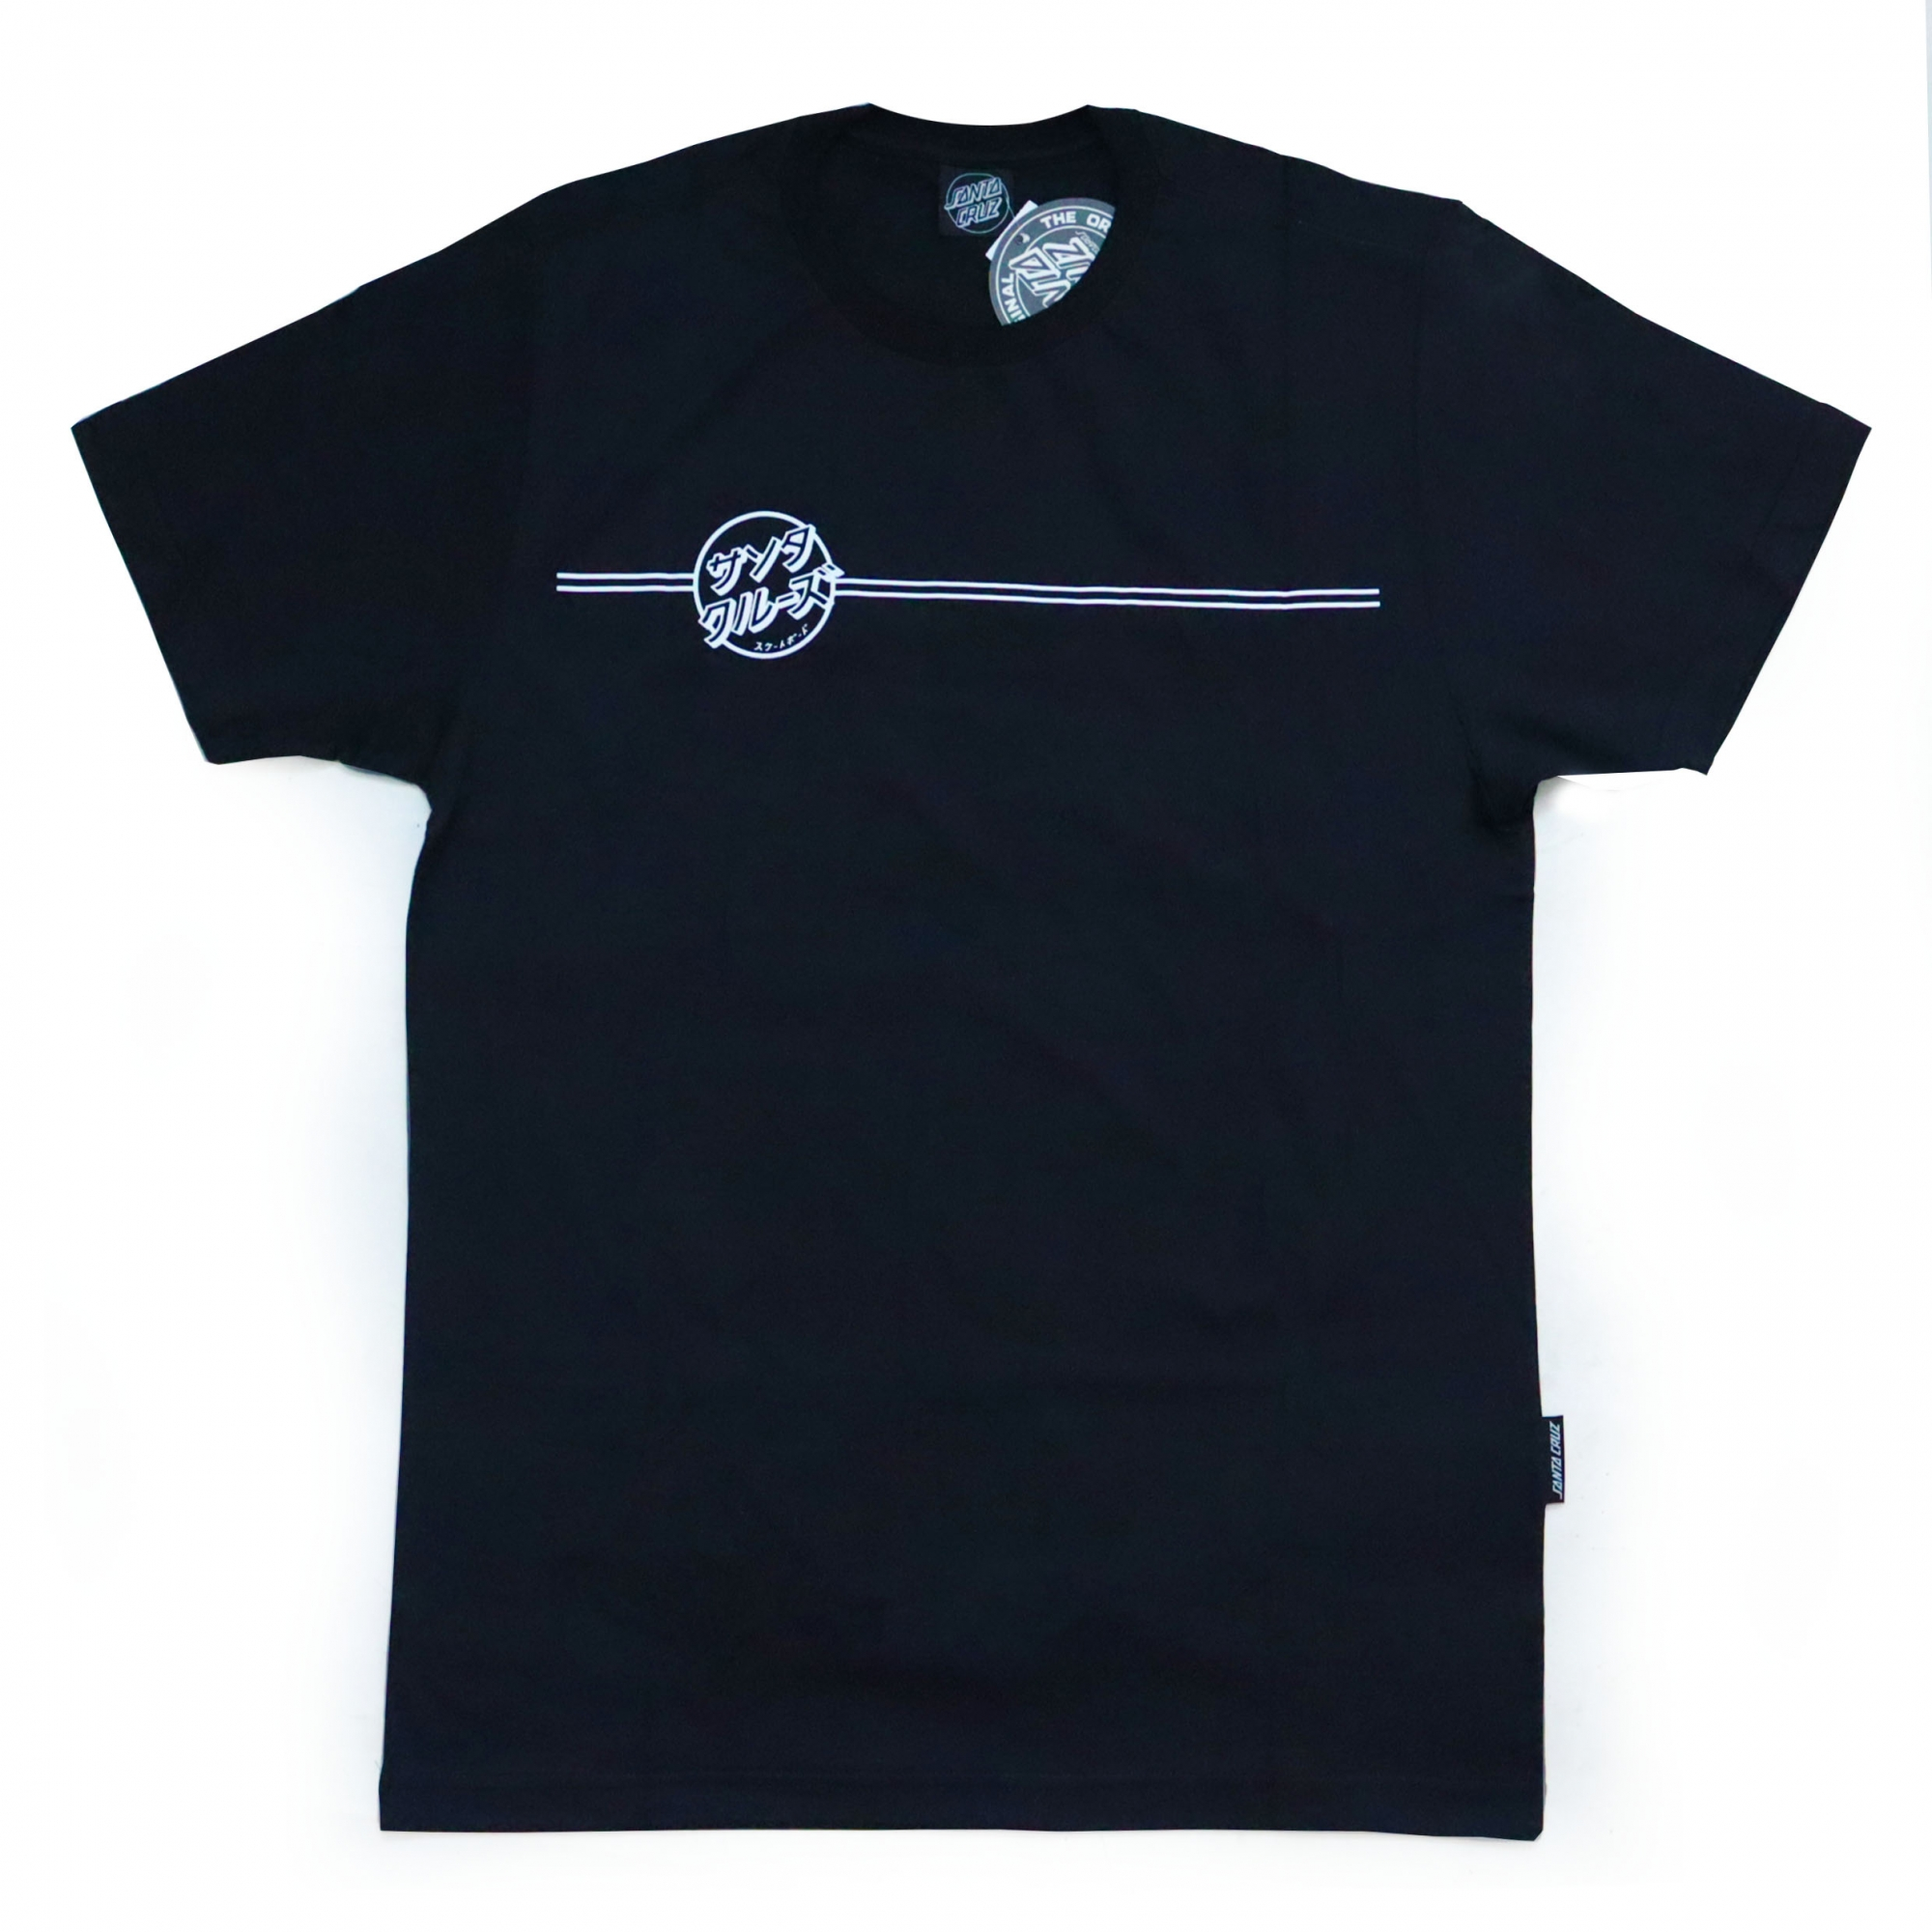 Camiseta Santa Cruz Bogus Hand - Preto